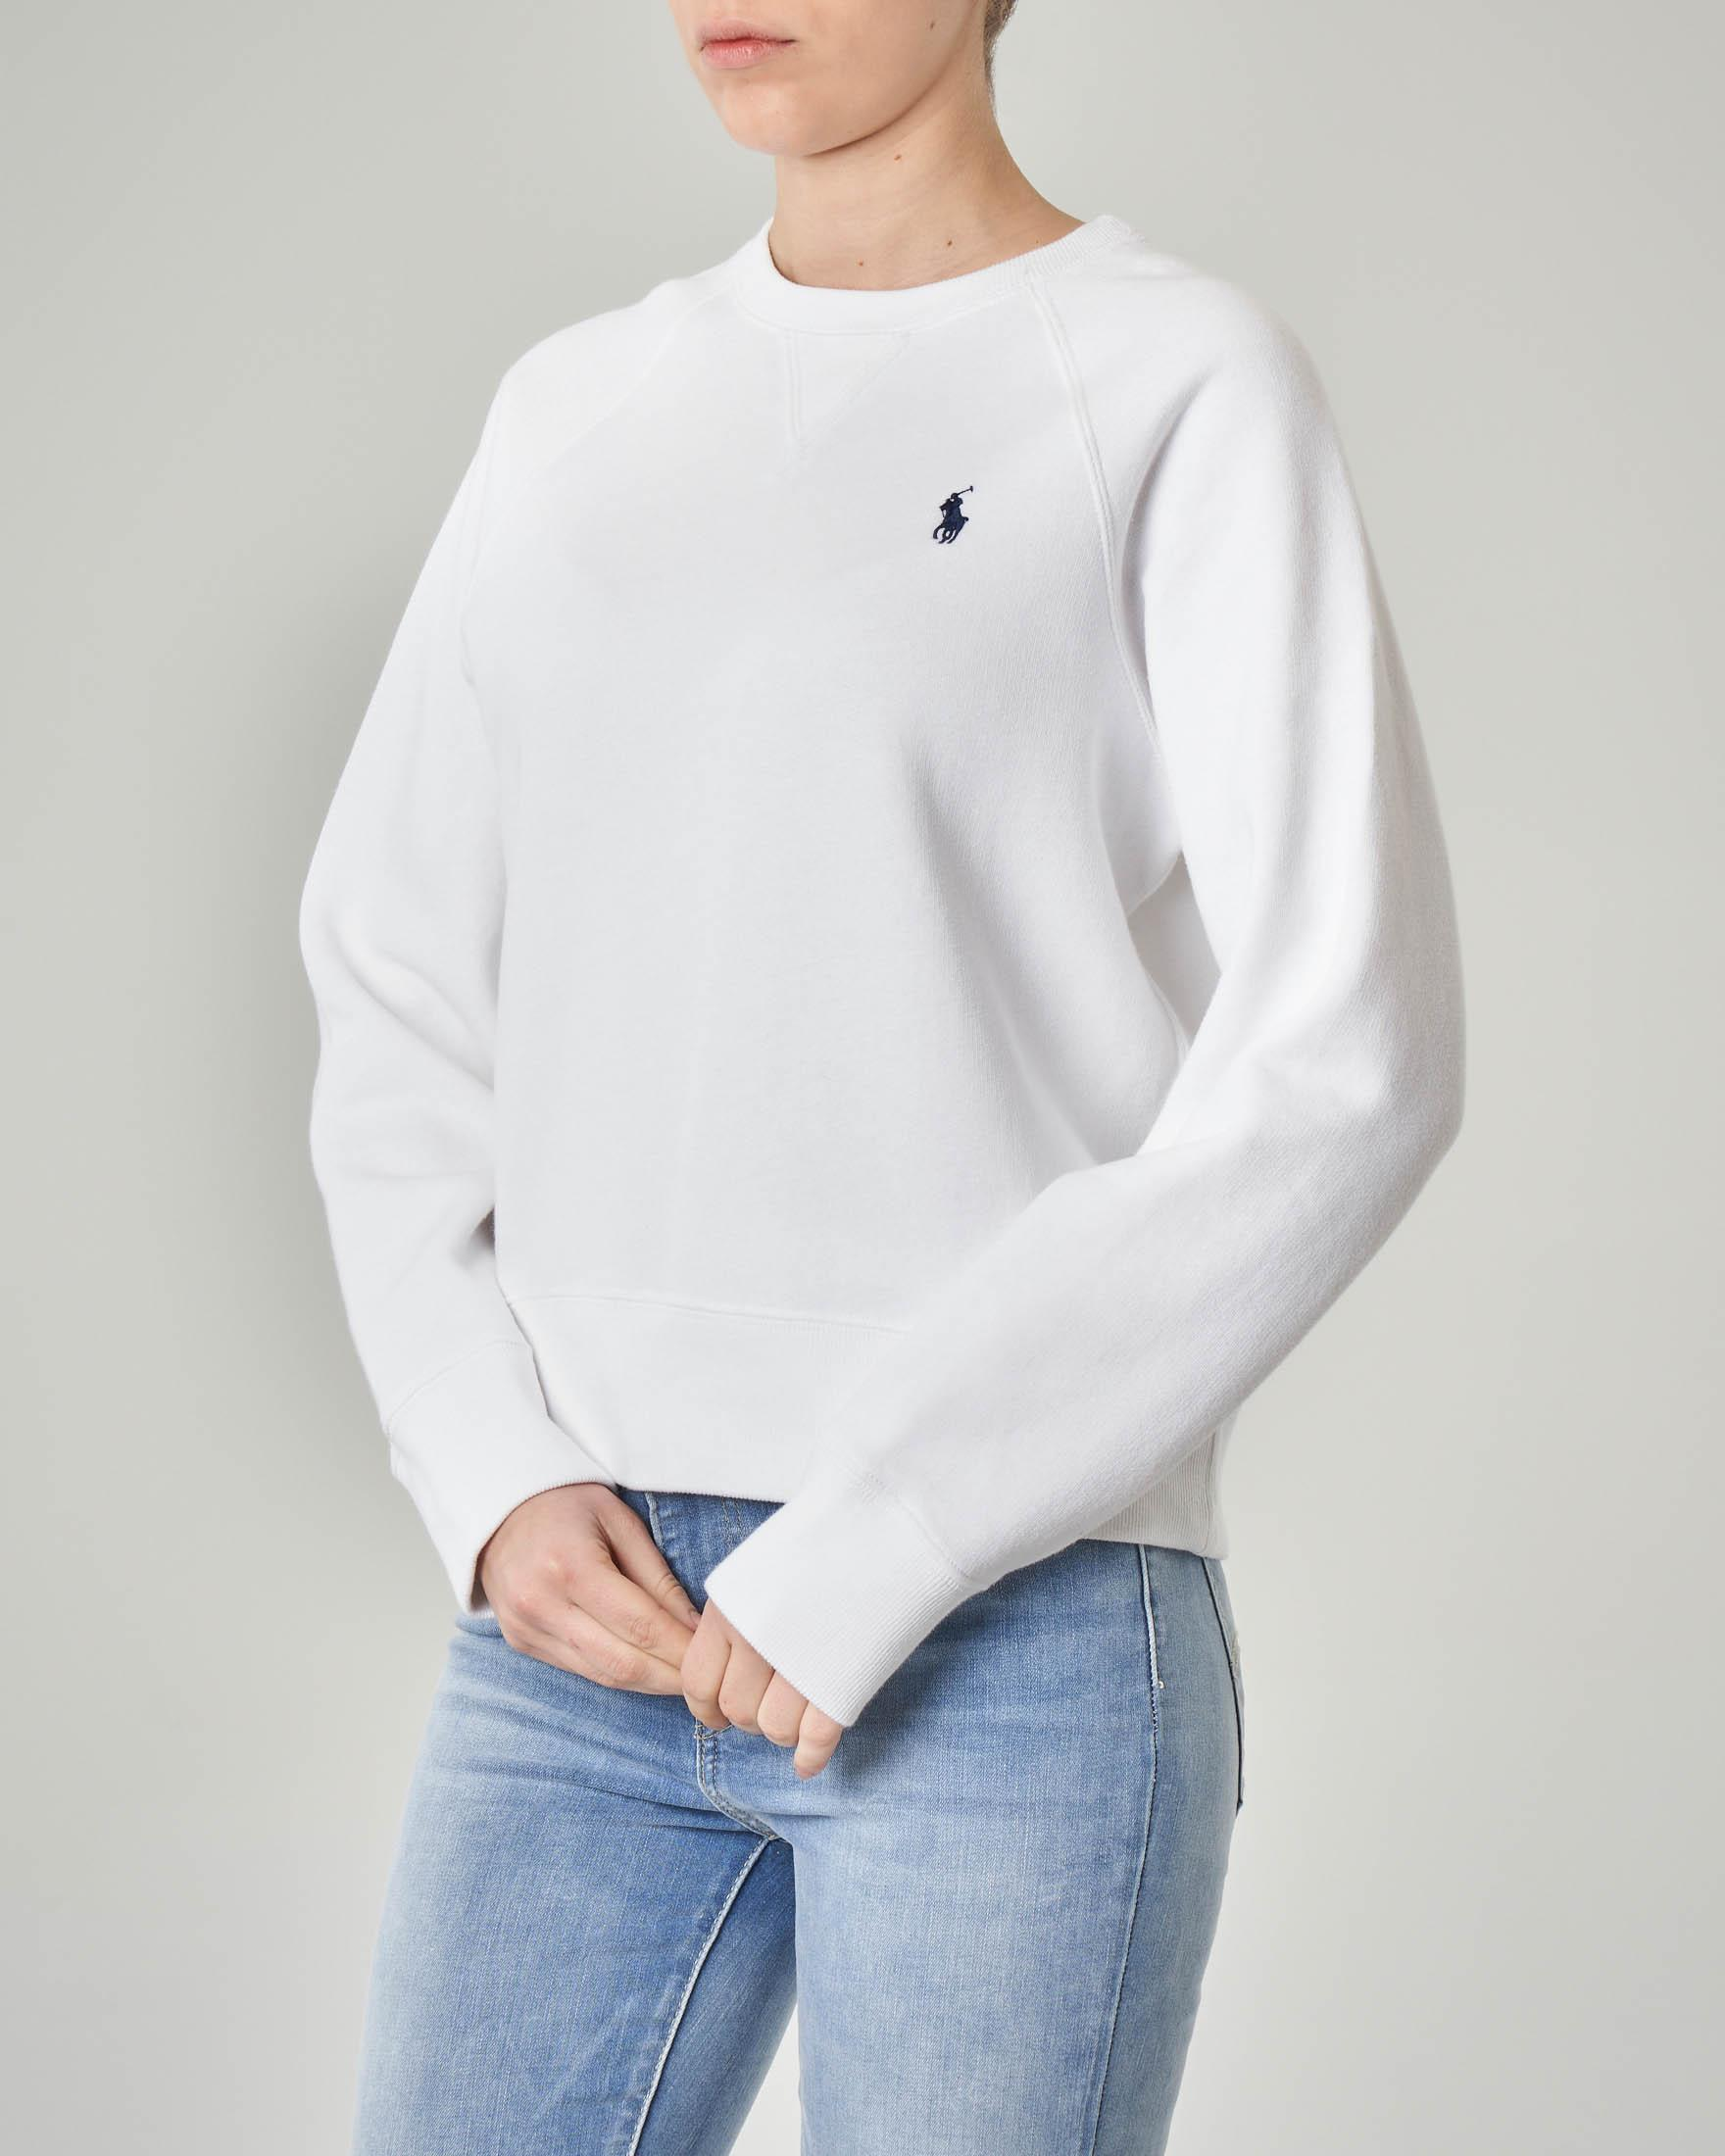 Felpa bianca girocollo in jersey di cotone